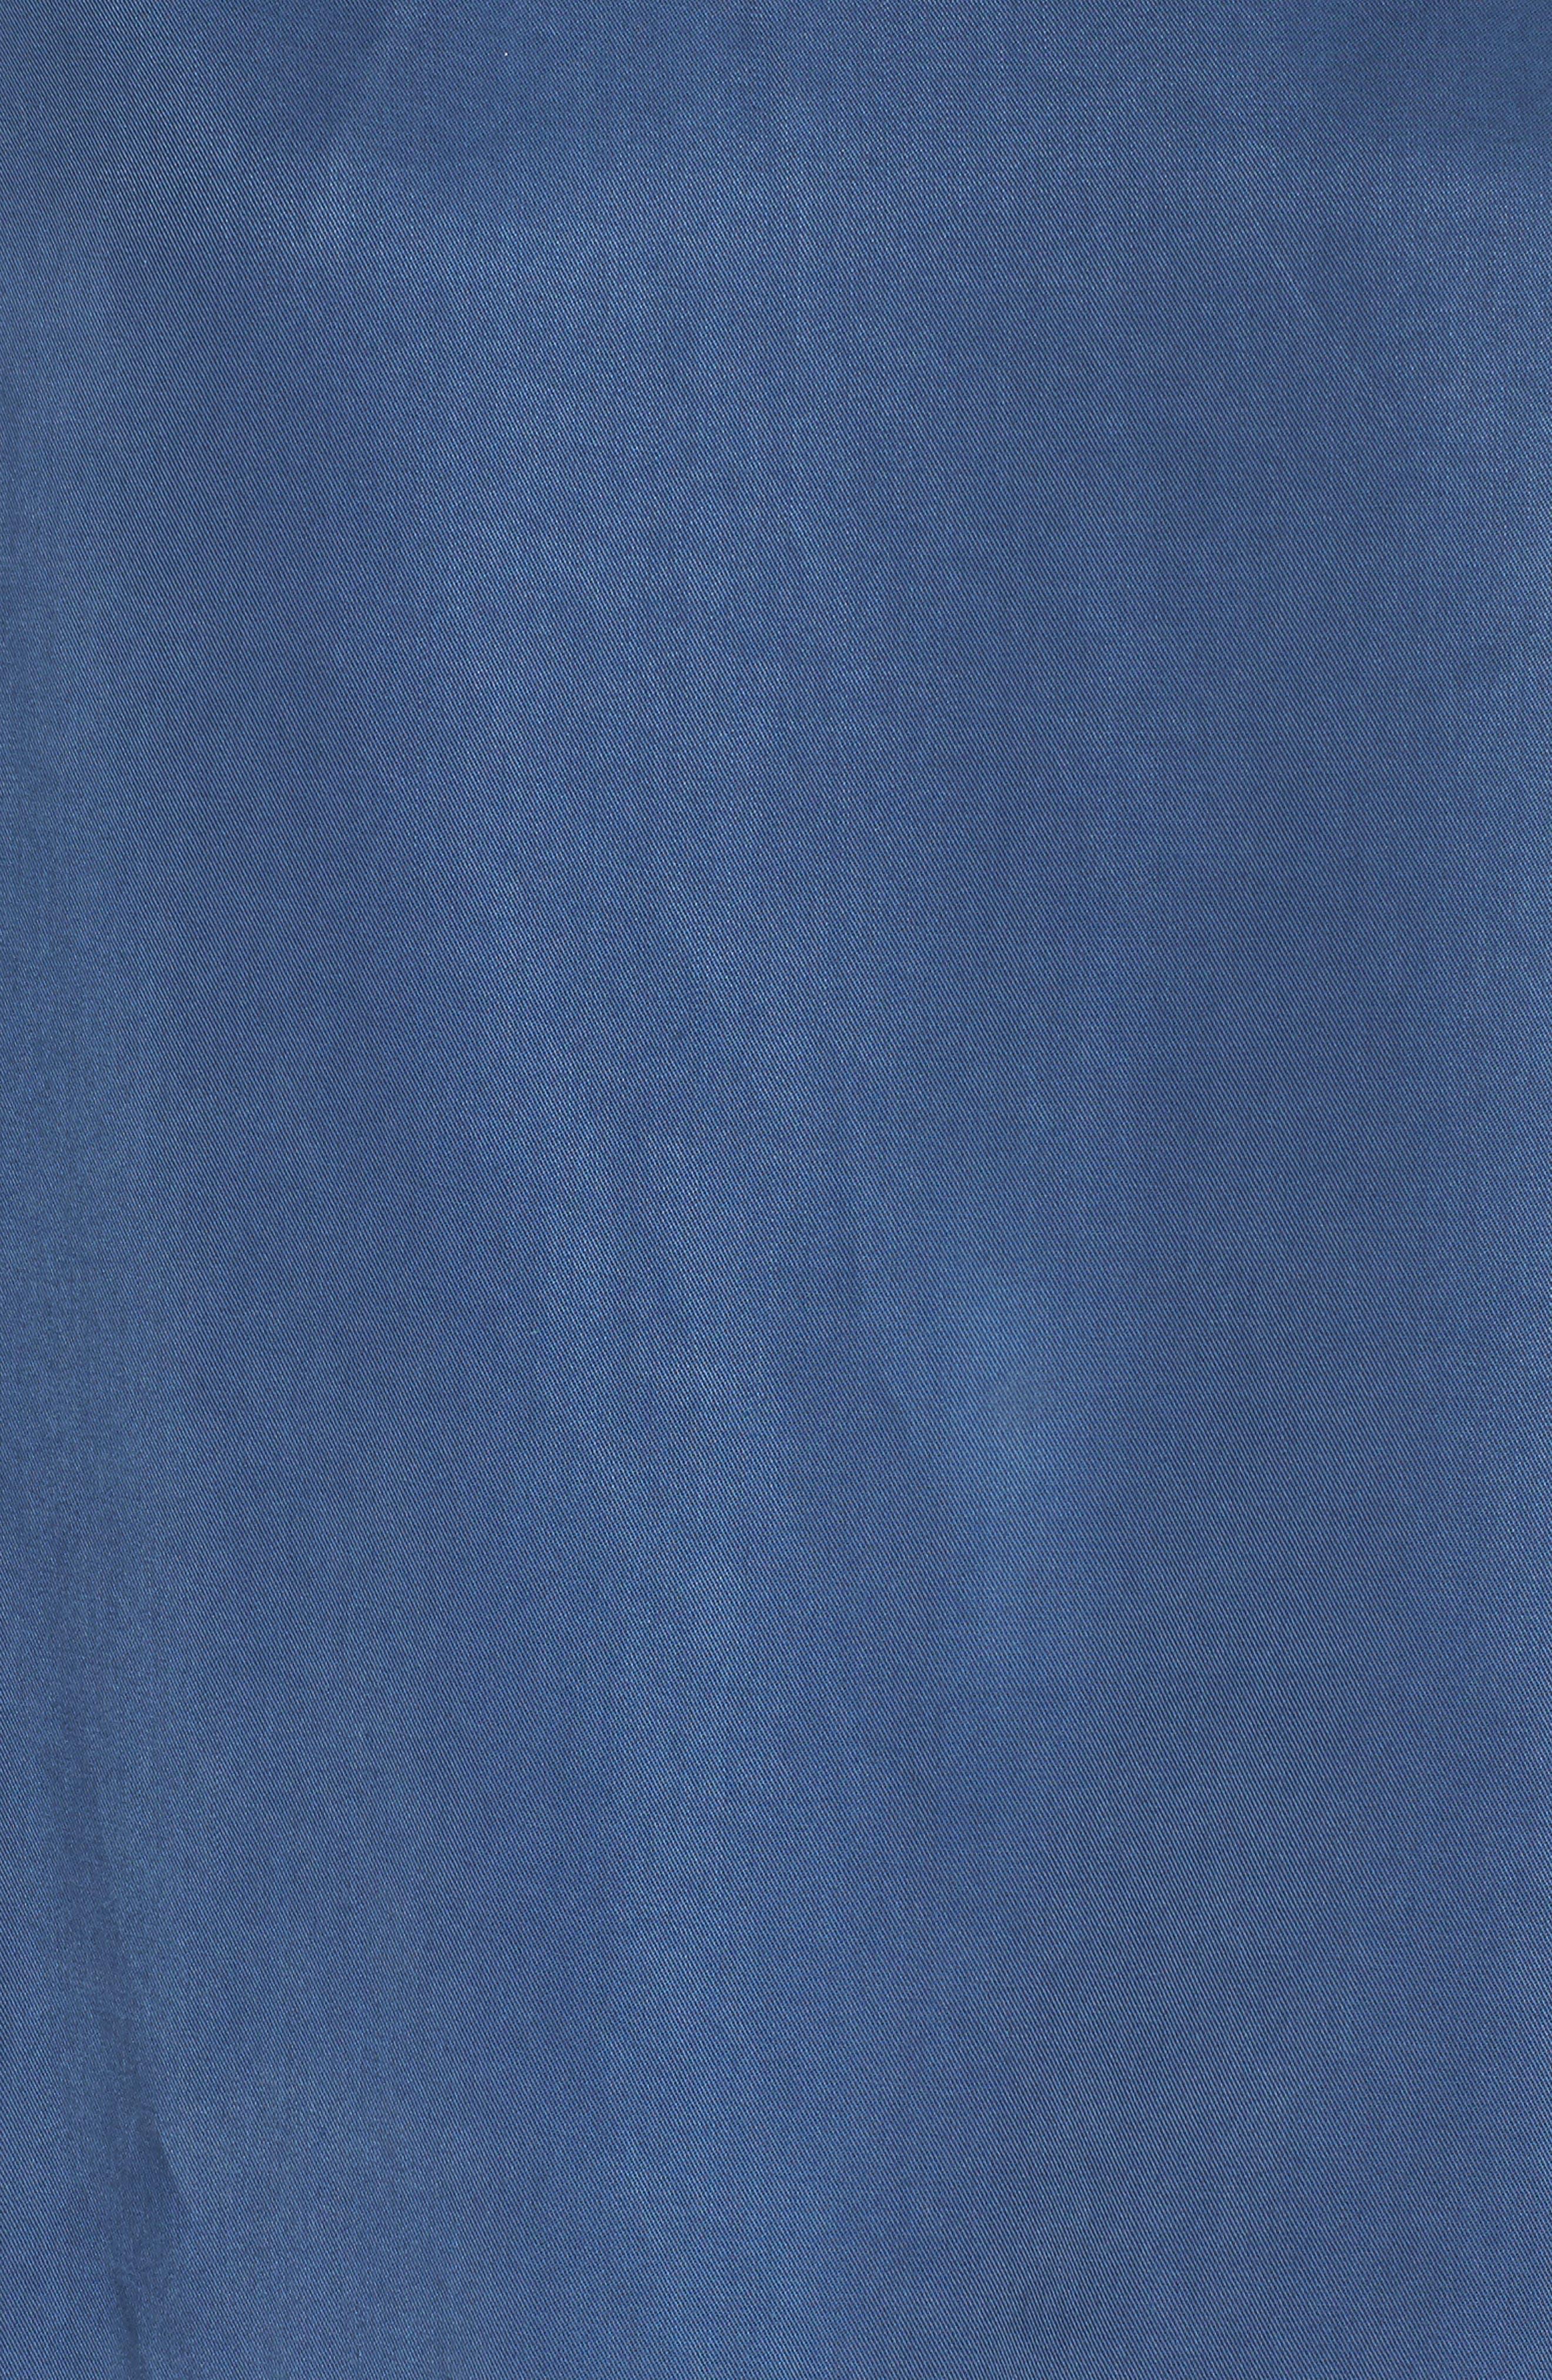 Lace-Up Shift Dress,                             Alternate thumbnail 5, color,                             Denim